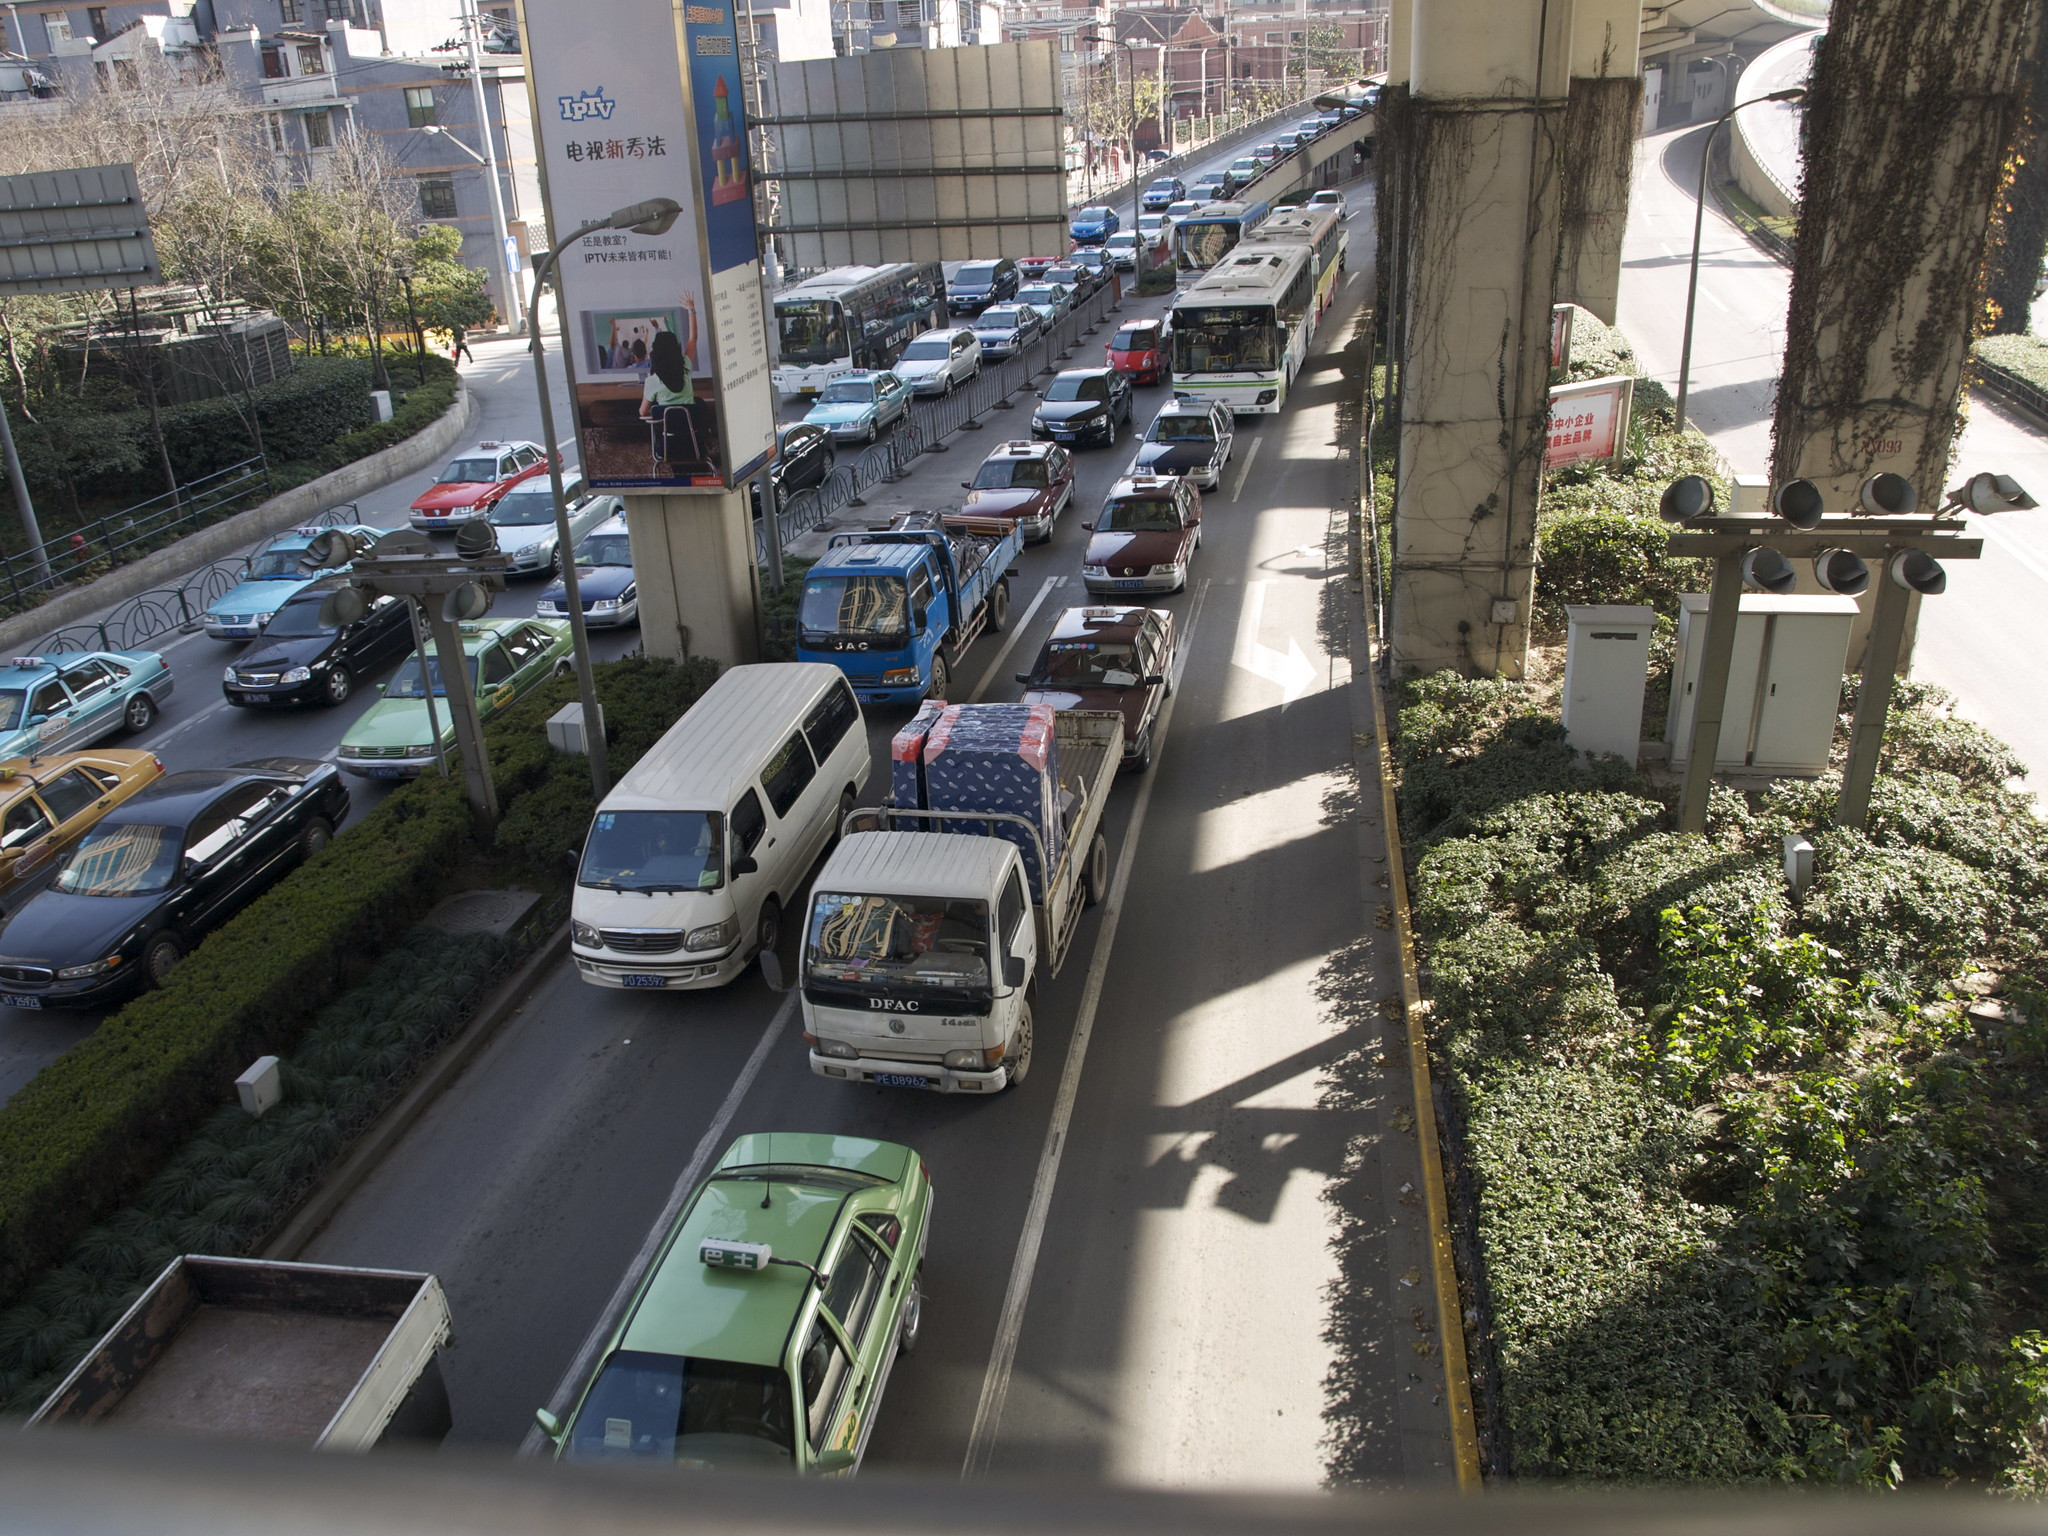 Ottoが物流革命を起こす?日本の自動運転化がぶつかる壁